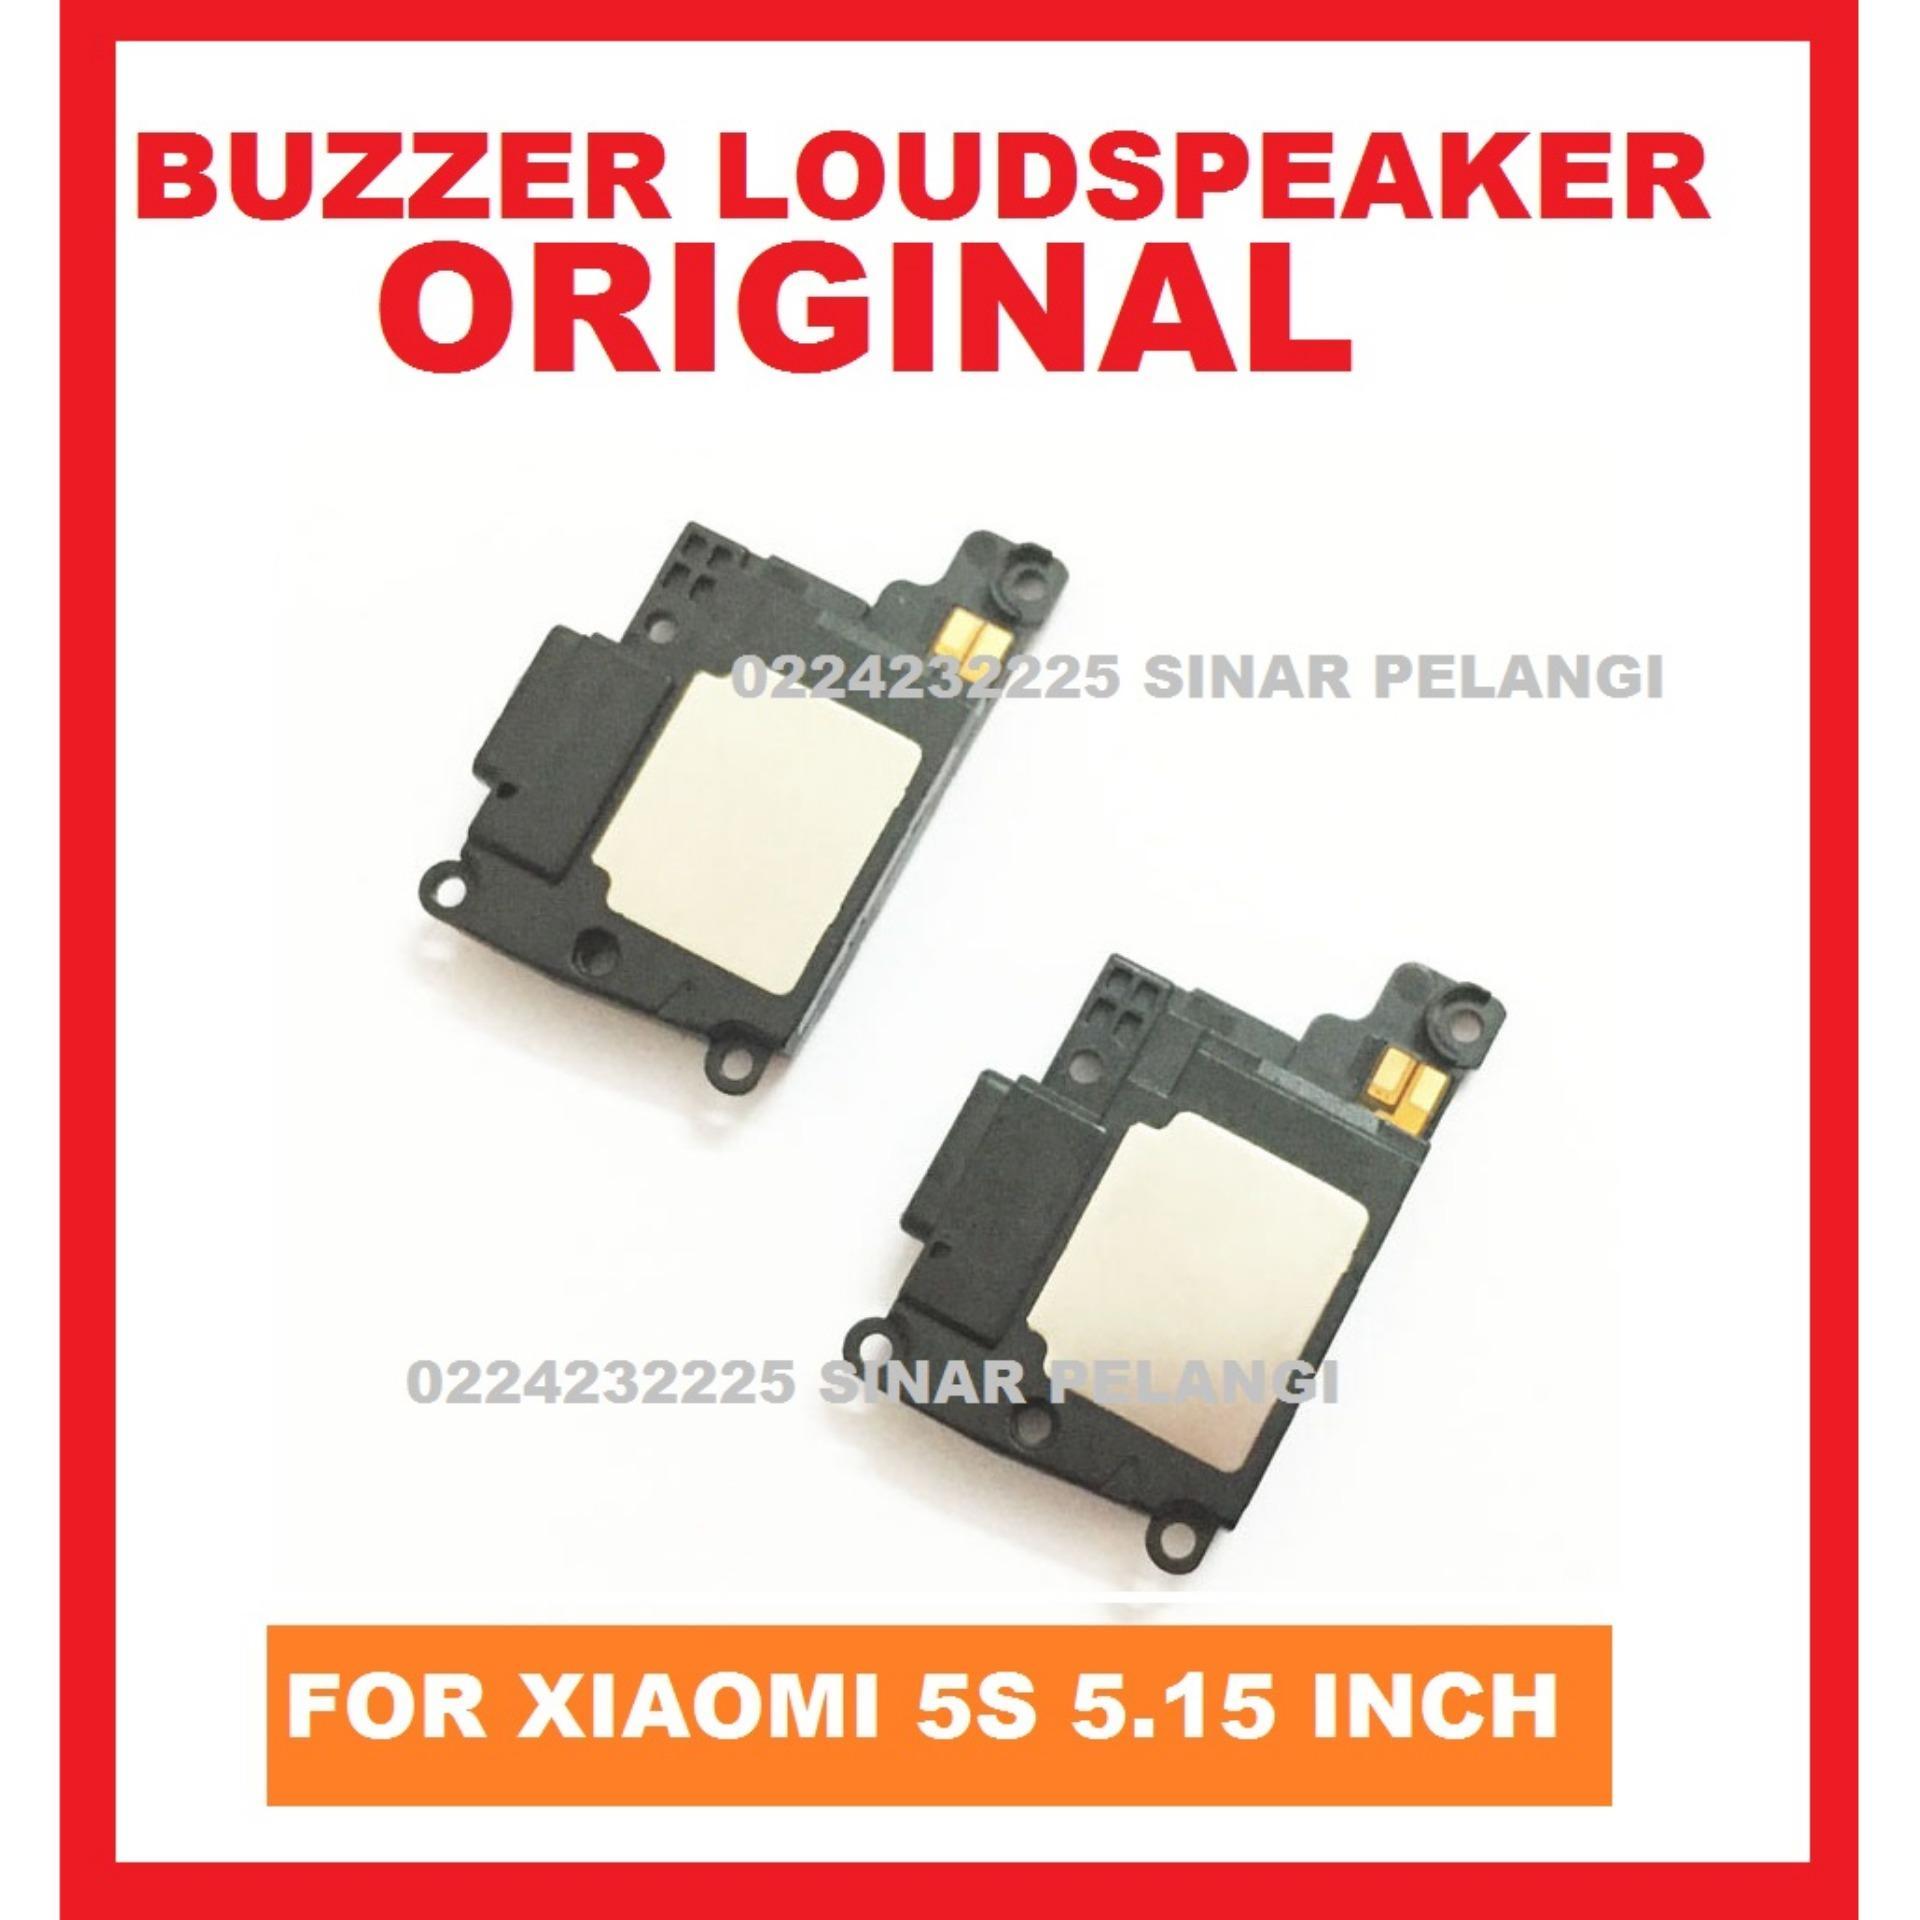 XIAOMI MI 5S 5.15 INCH FULLSET BUZZER BAZZER SPEAKER MUSIK LOUDSPEAKER ORIGINAL 907274